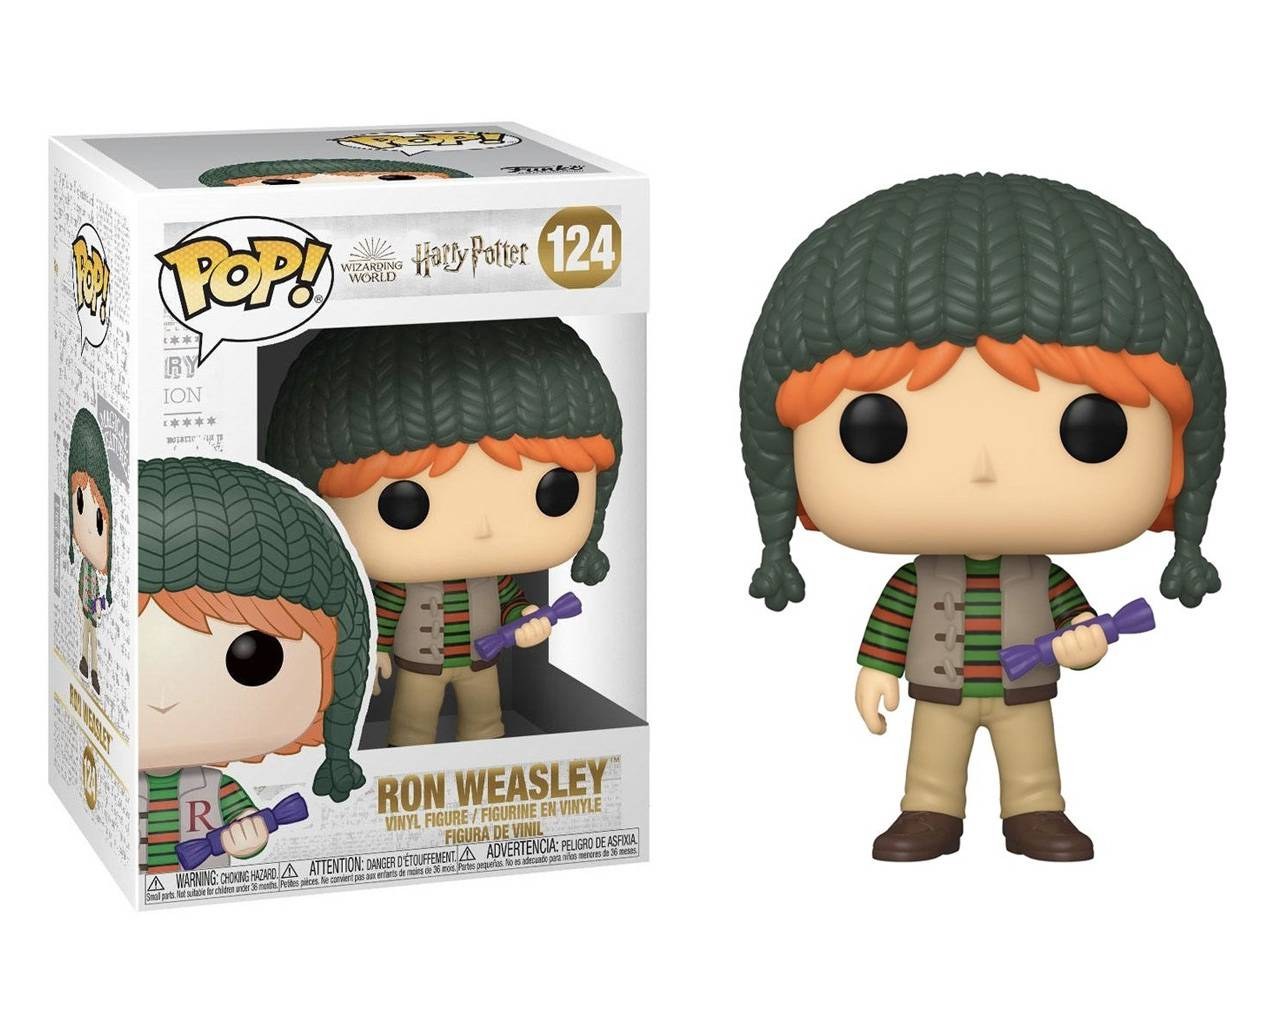 Ron Weasley (Holiday) Pop! Vinyl